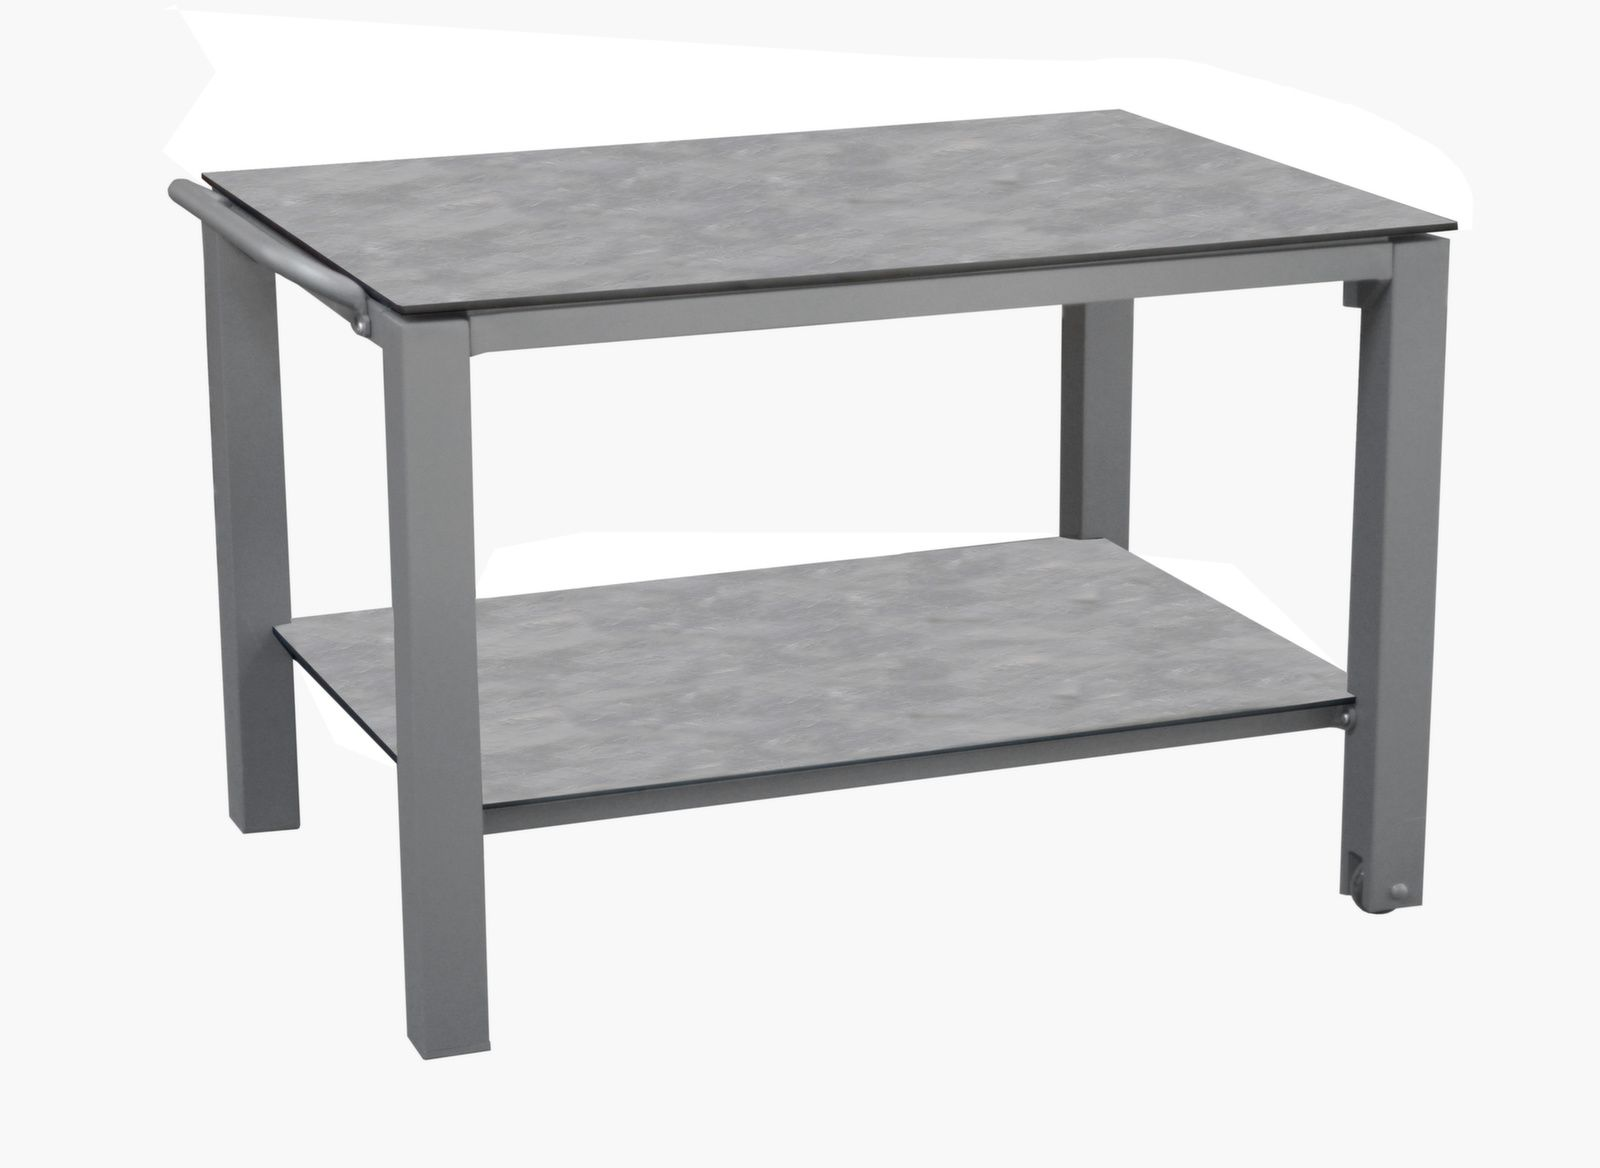 table plancha 100 x 70 cm plateau arpa tables de jardin. Black Bedroom Furniture Sets. Home Design Ideas